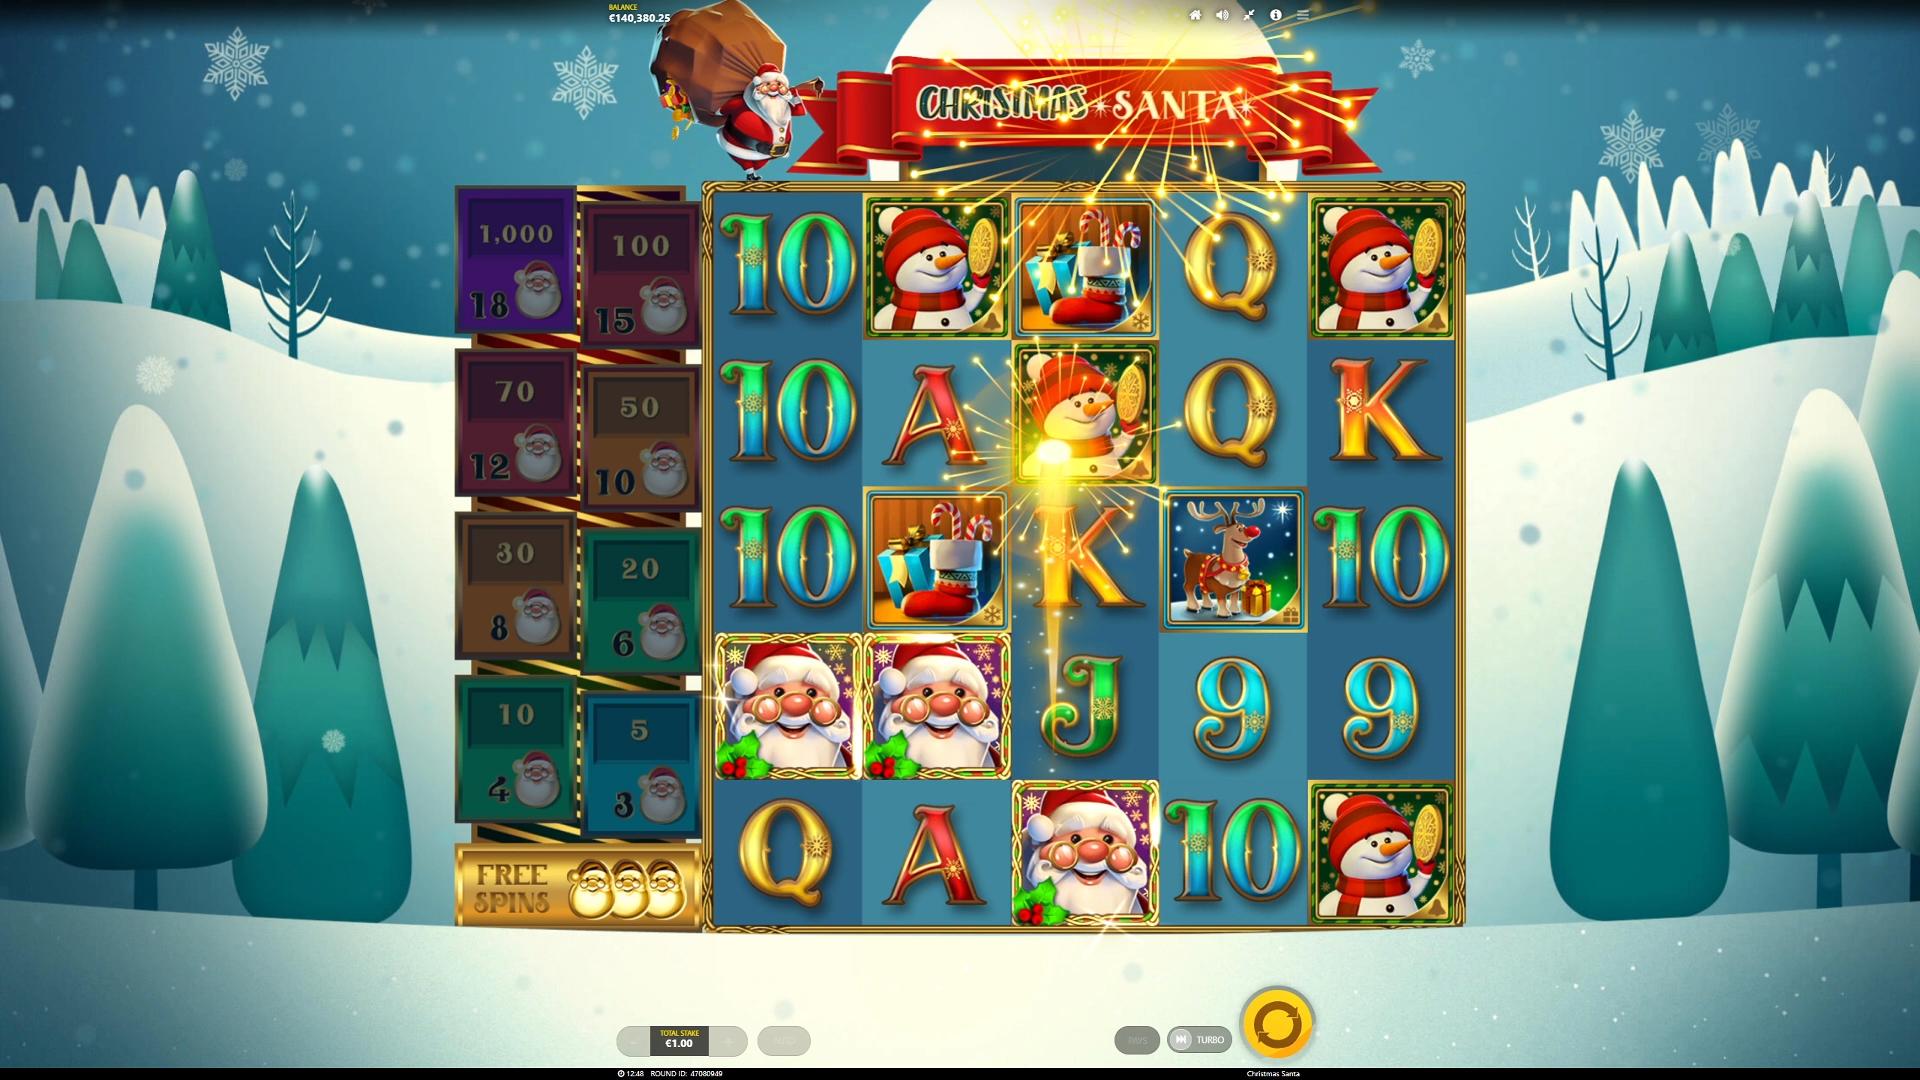 Christmas_Santa_Screenshot_FS_Trigger